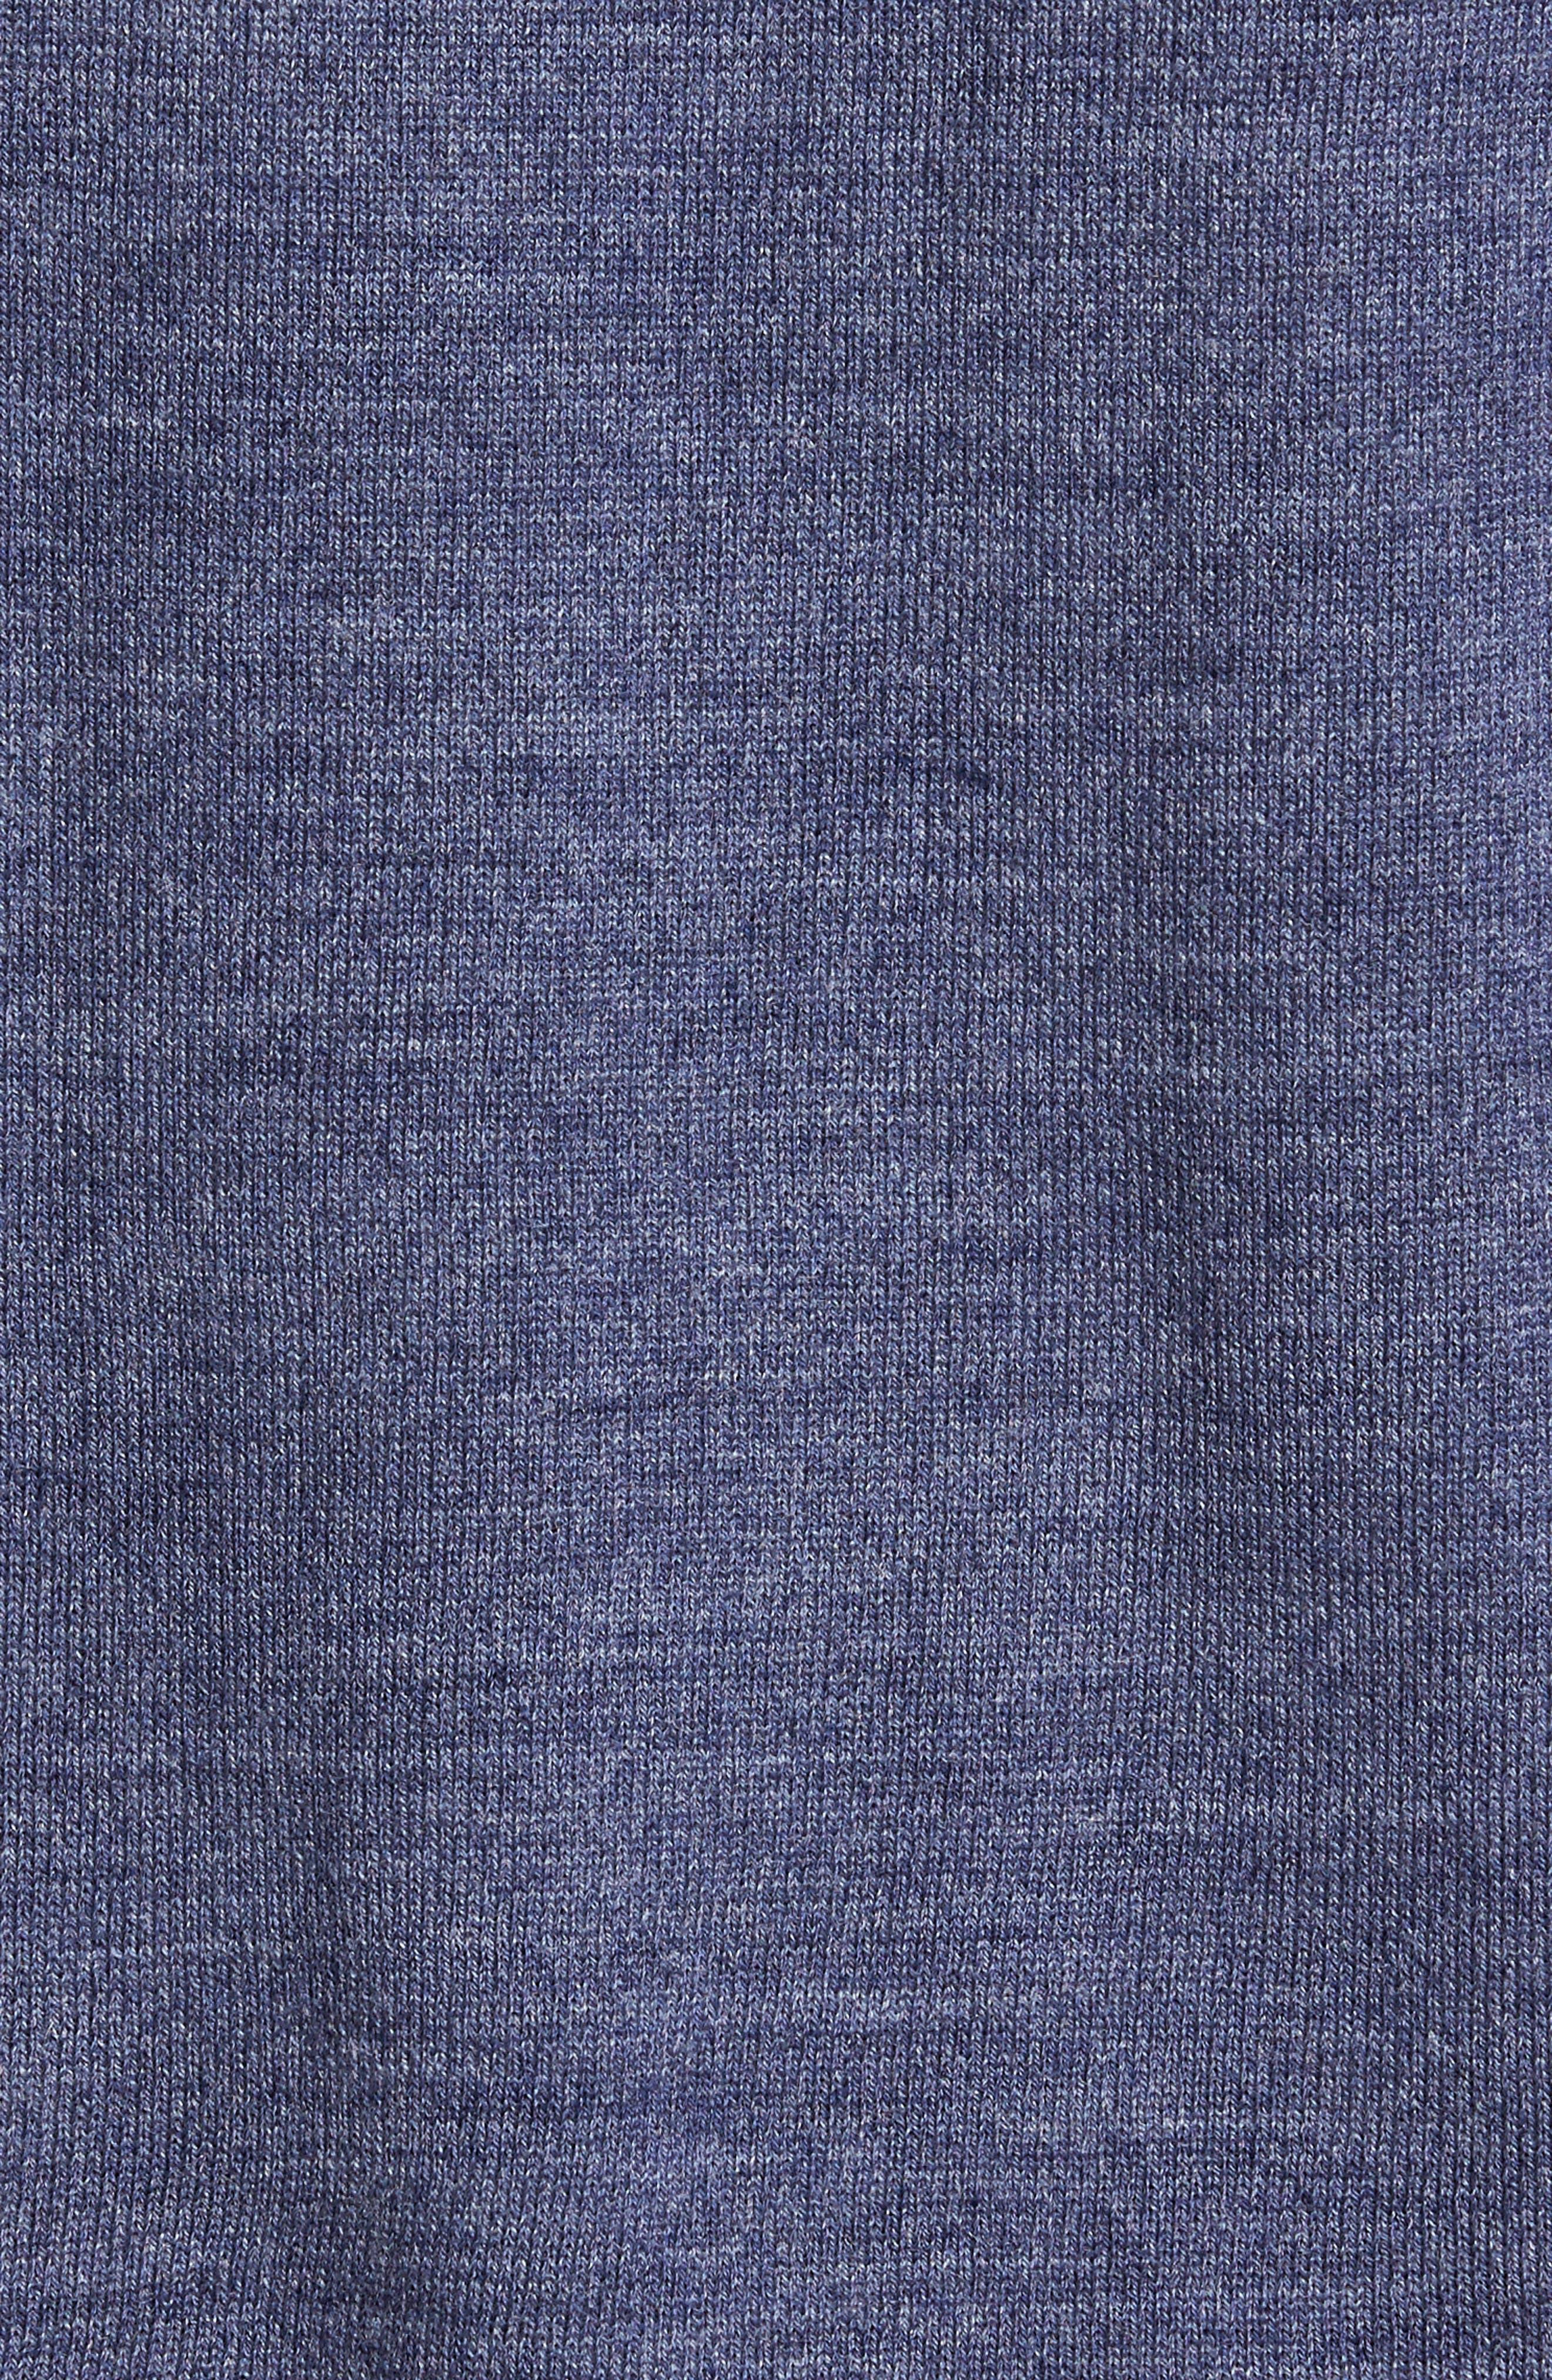 Merino Blend Crewneck Sweater,                             Alternate thumbnail 20, color,